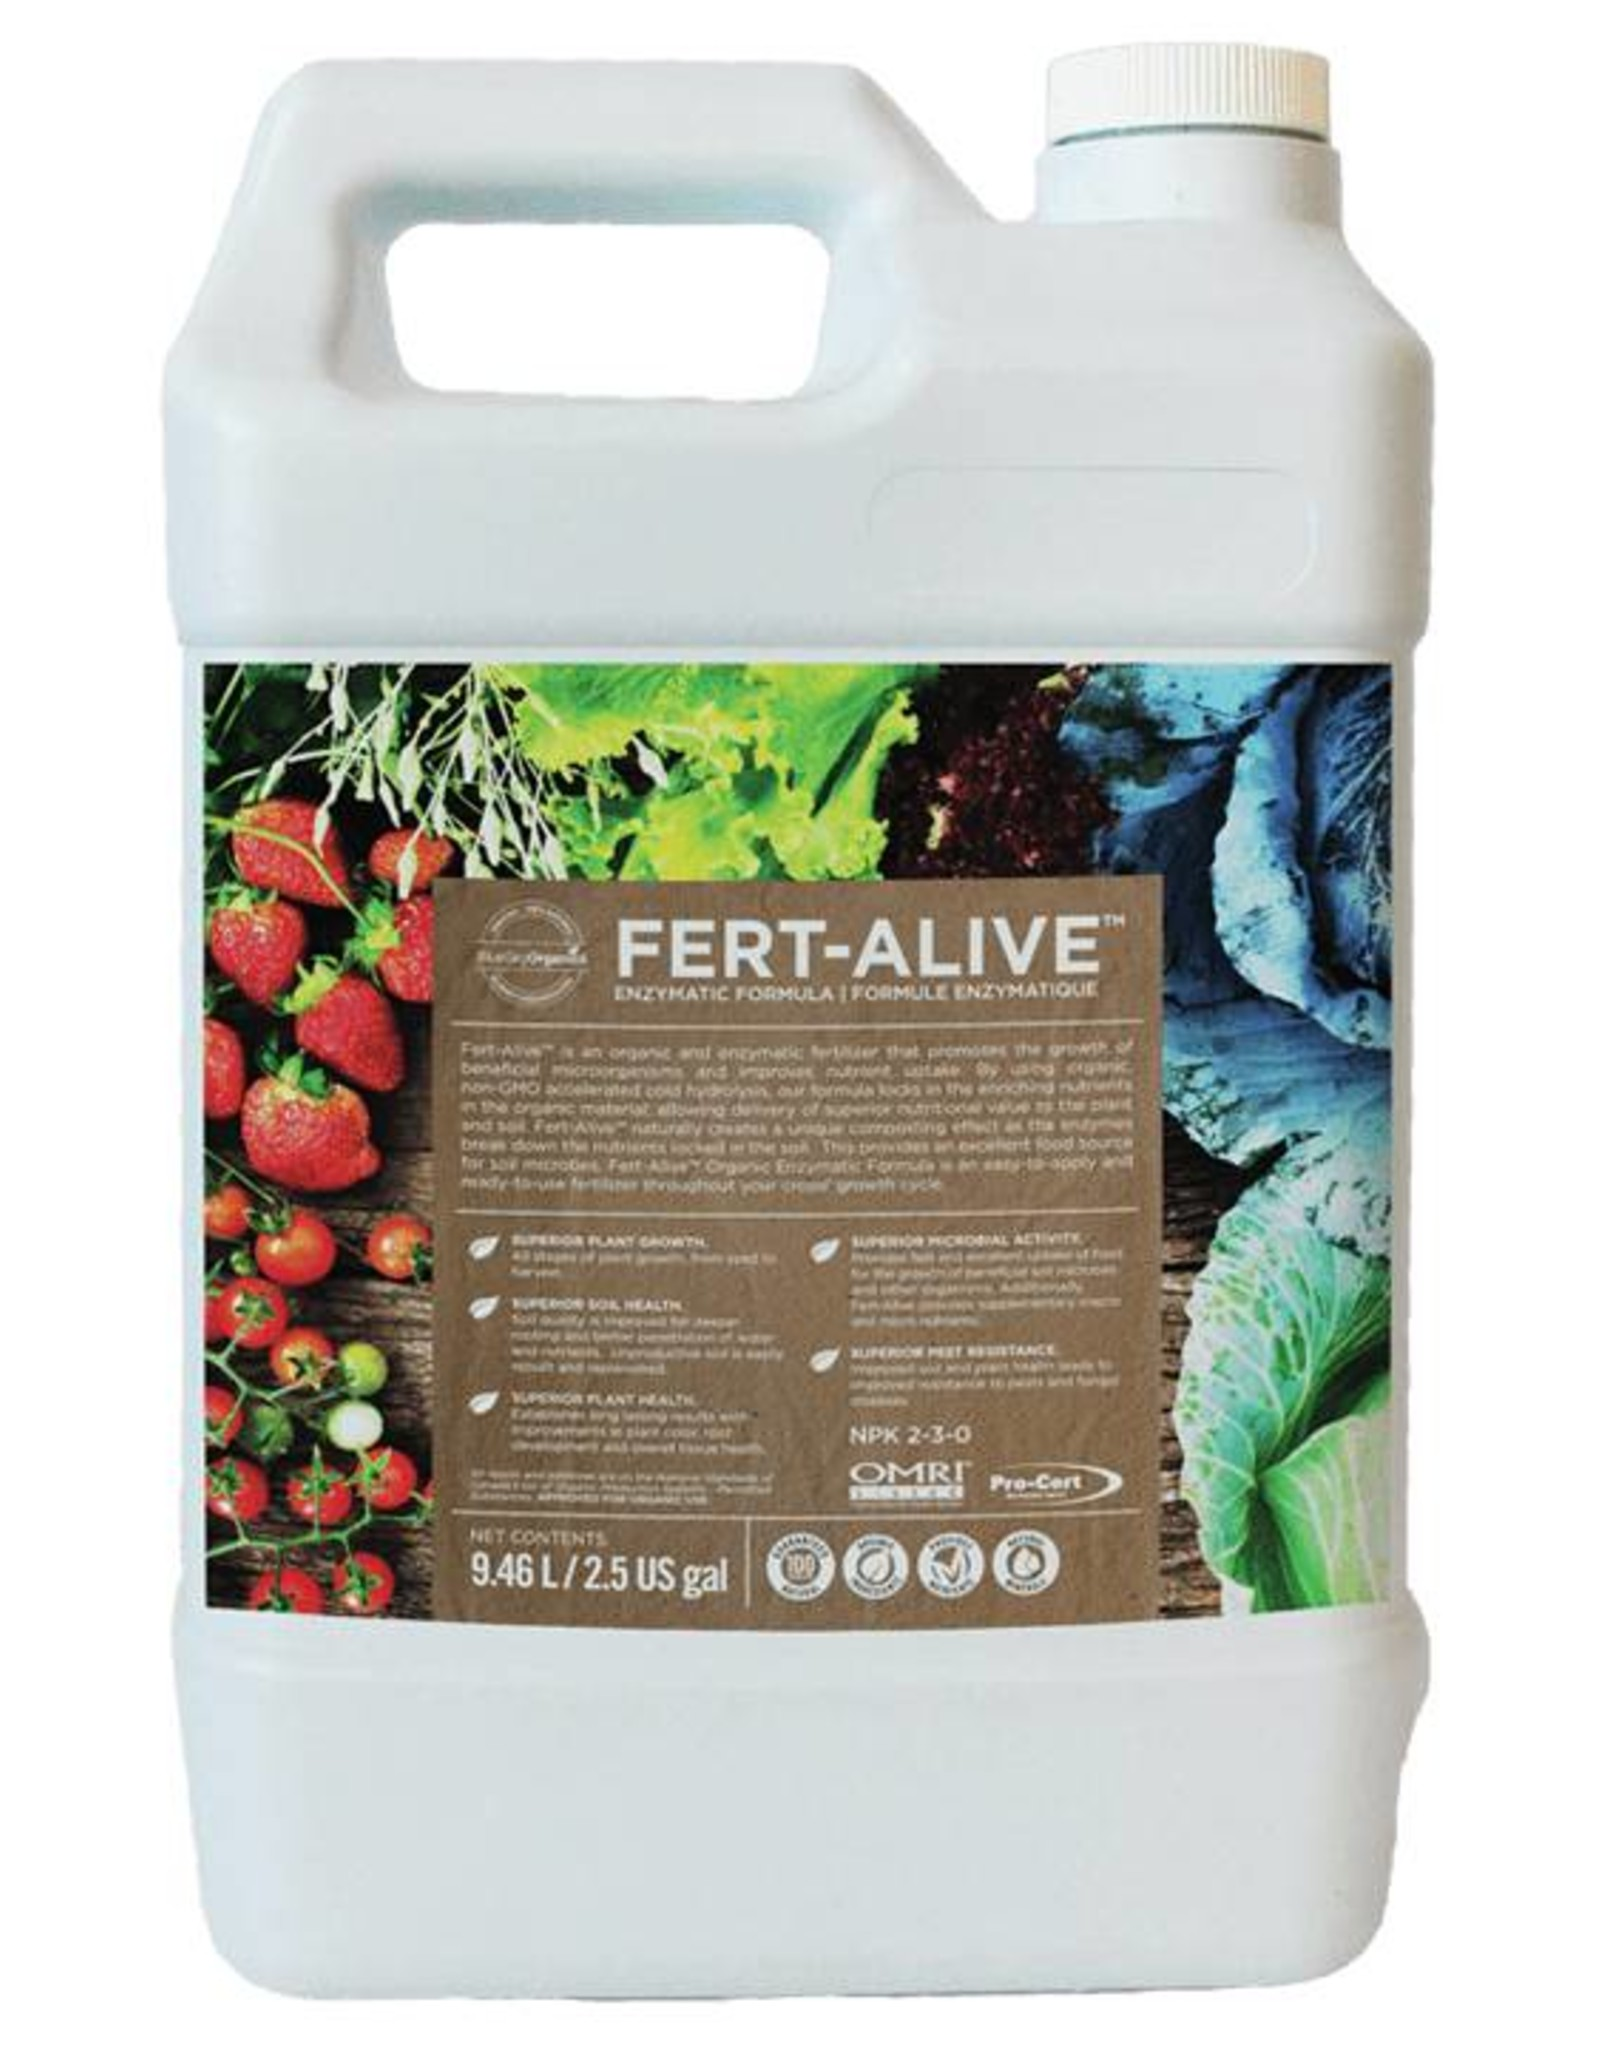 BlueSky Organics Fert-Alive 5gal